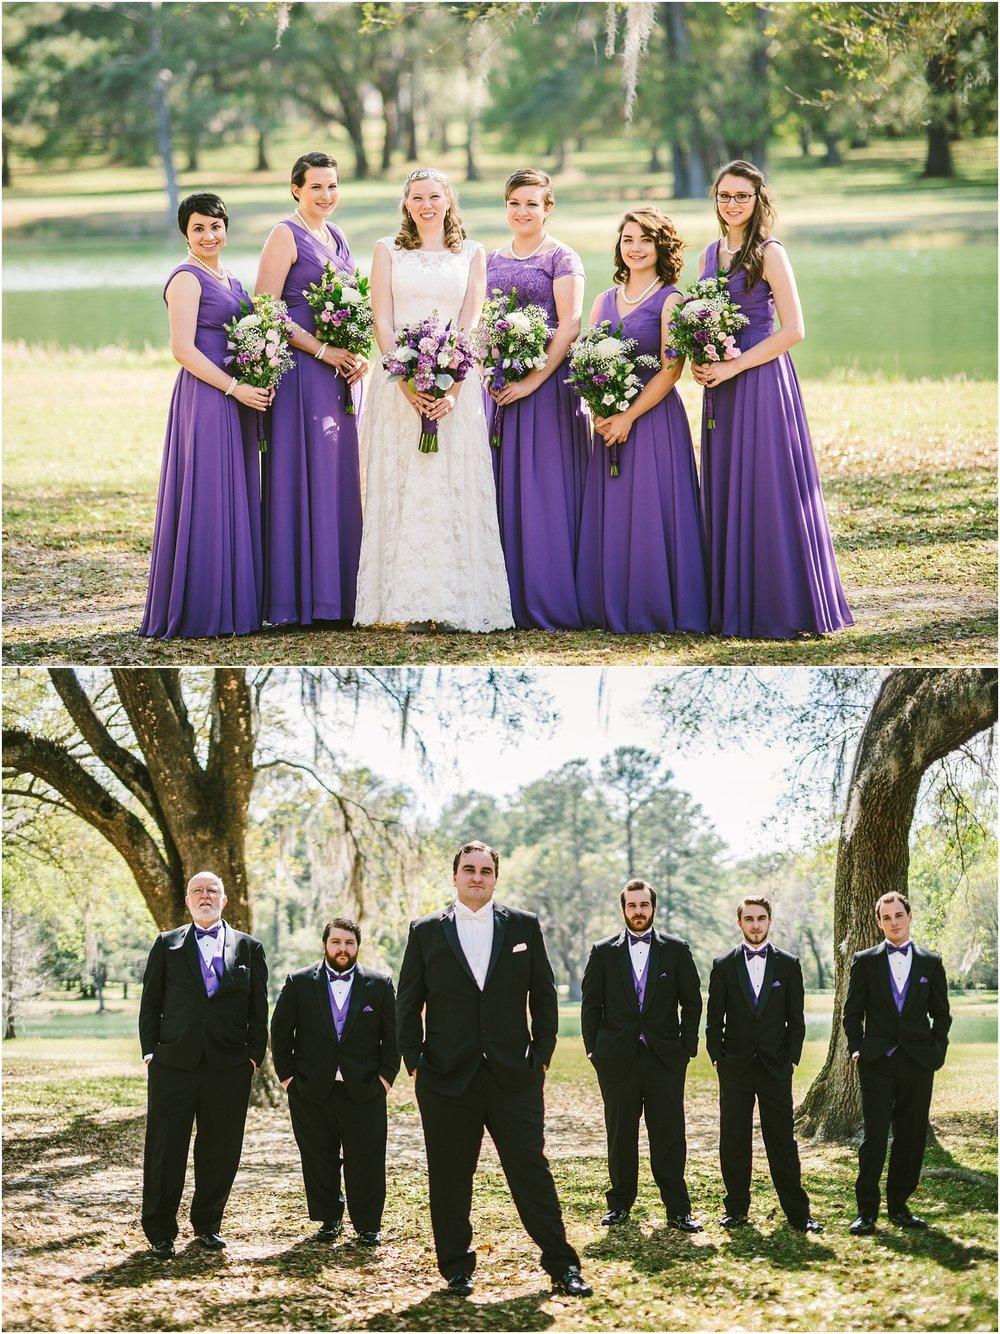 bradleys-pond-tallahassee-wedding-March-2017_0030.jpg